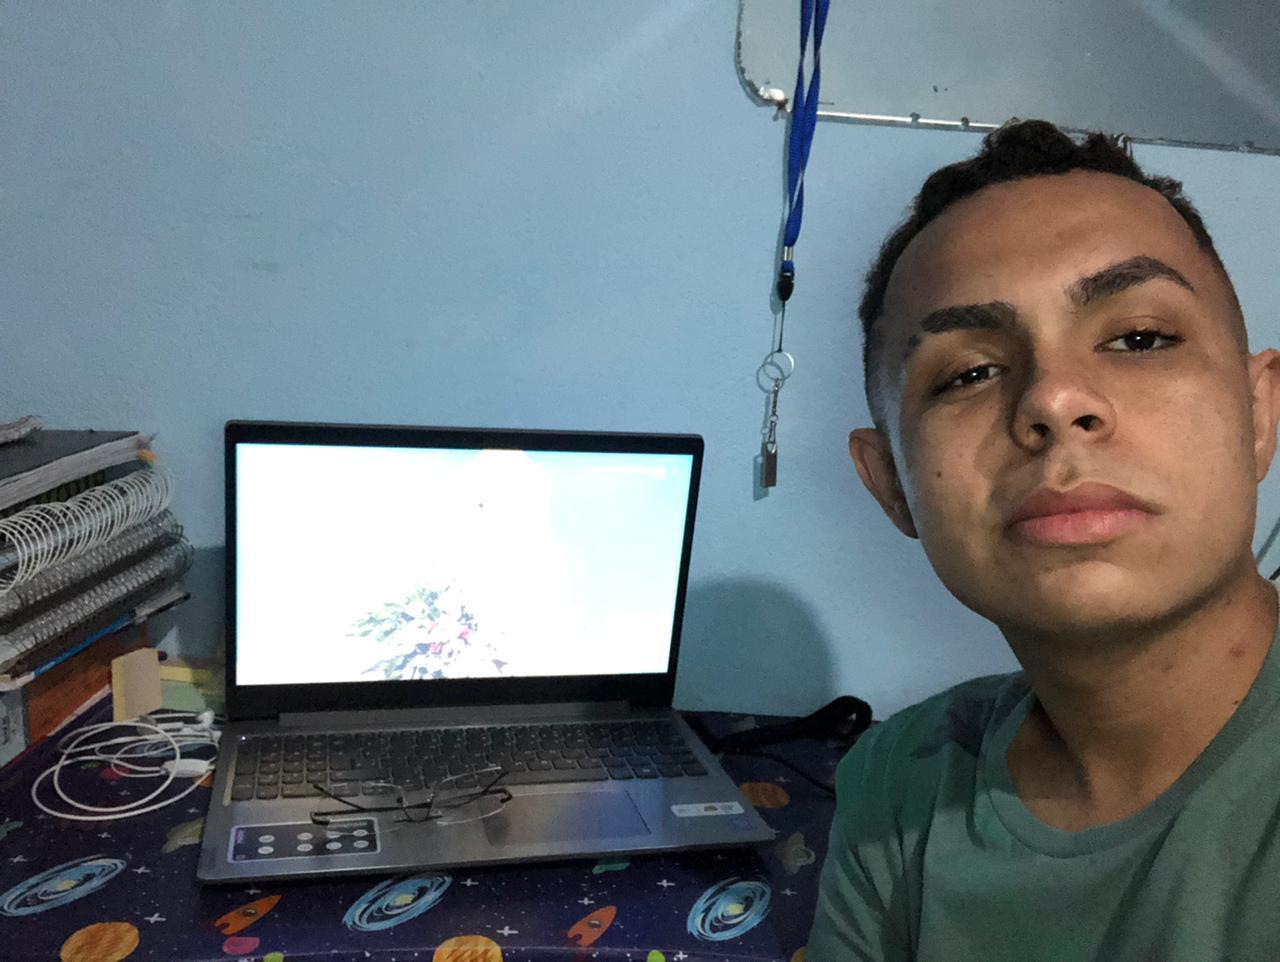 José Romualdo está em dúvida entre Medicina e Biomedicina